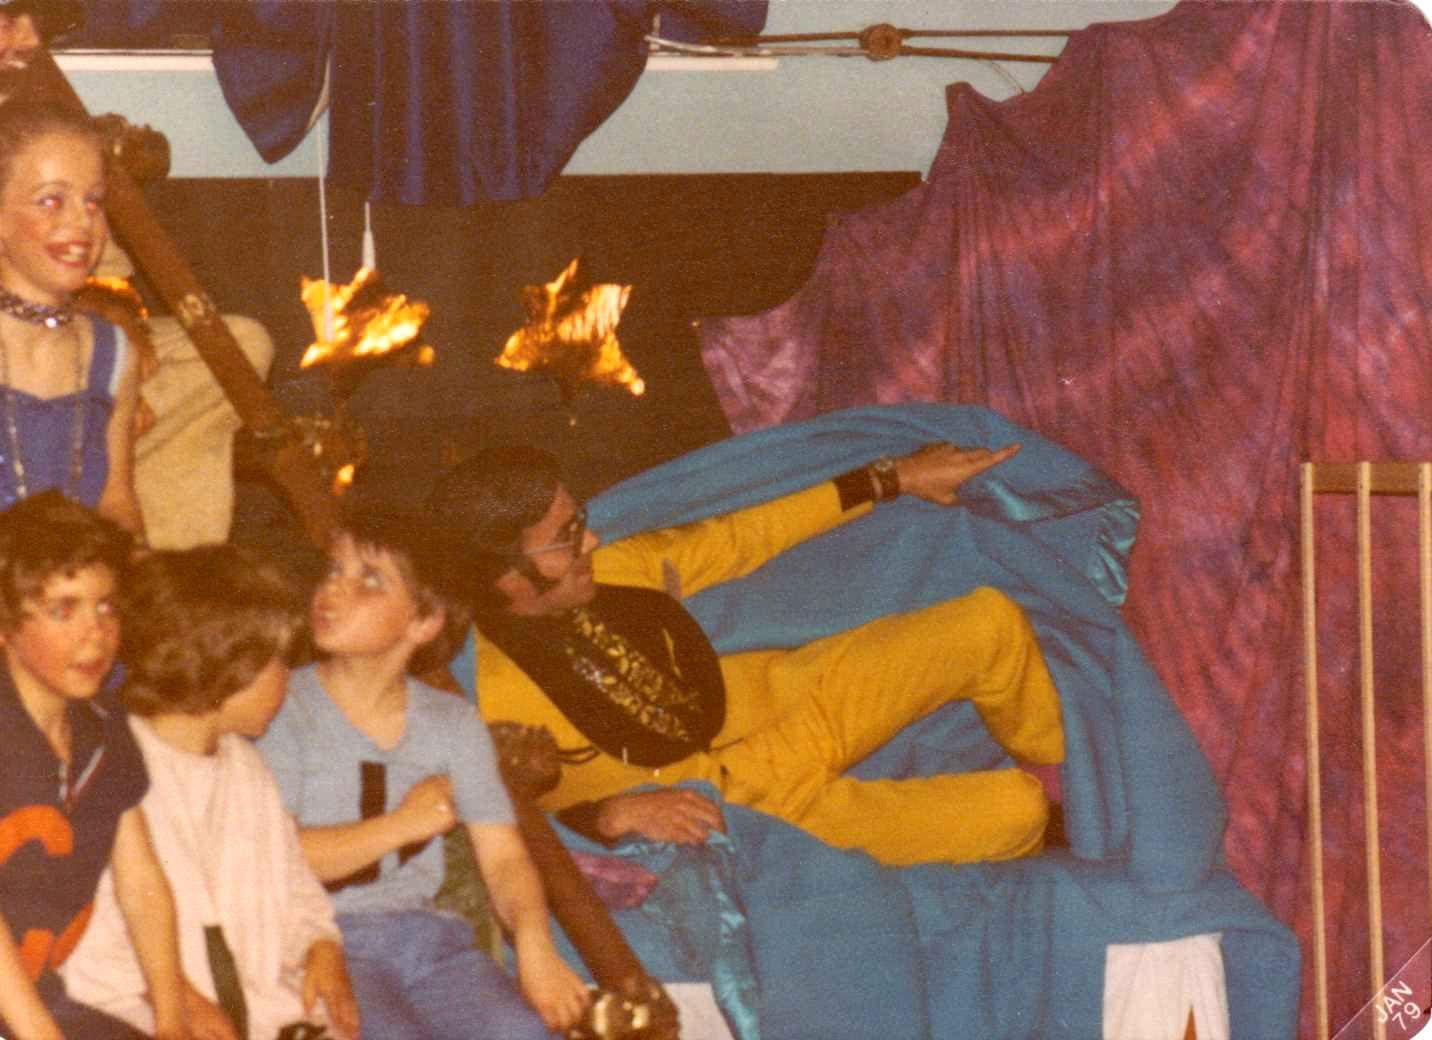 c. 1978 - The Amazing Technicolour Dreamcoat Production. Martin Cox (Headteacher) as Pharoah.